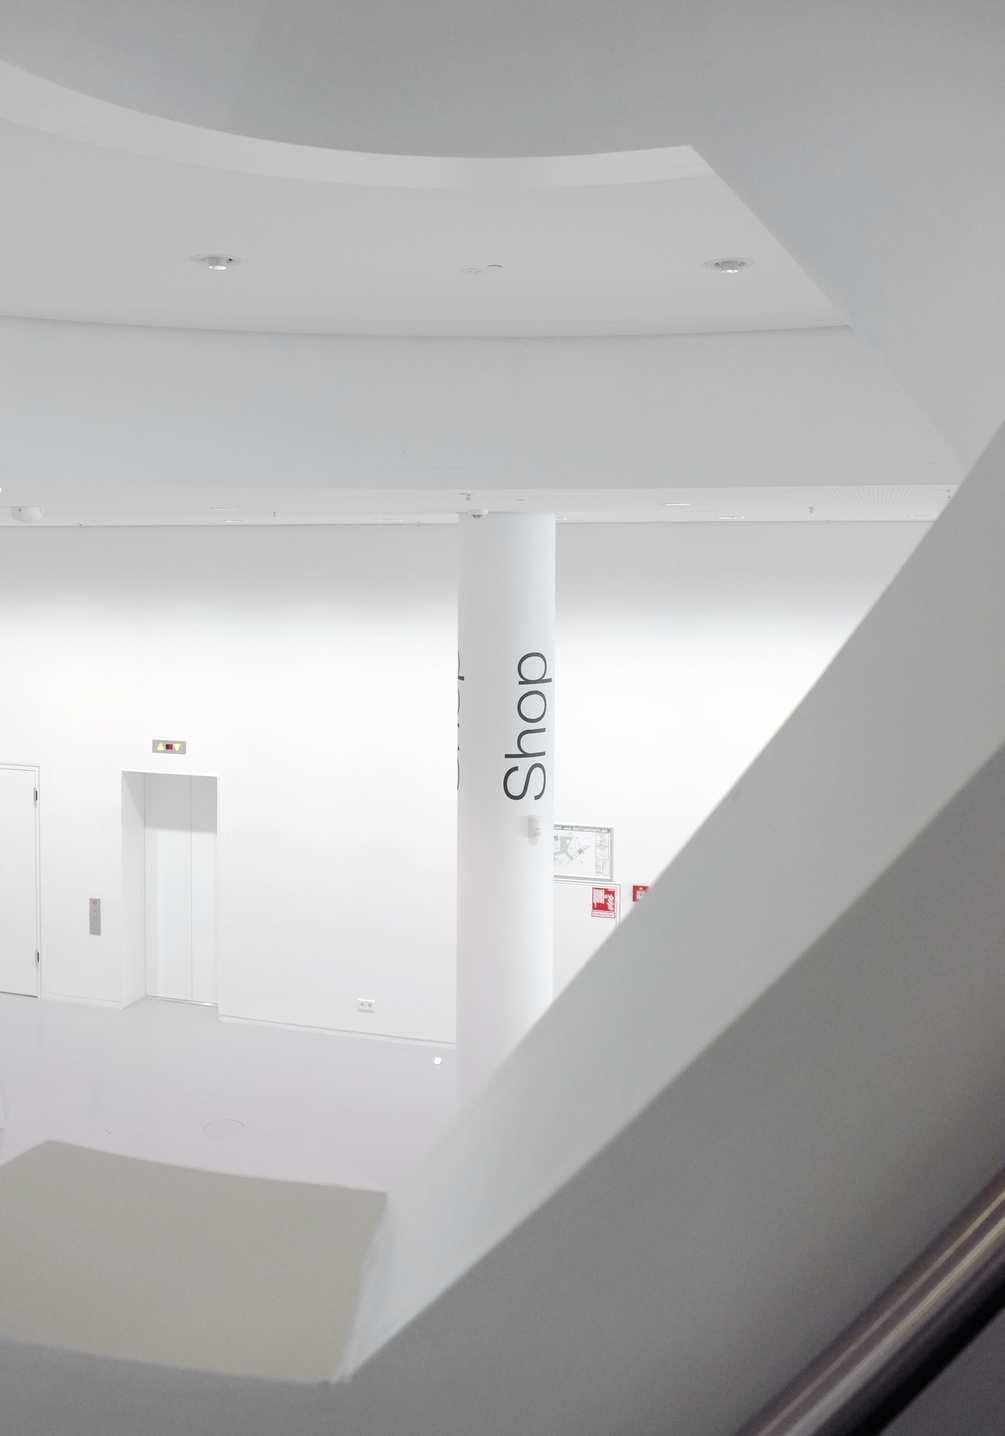 wayfinding-museum-2-1005x1435px